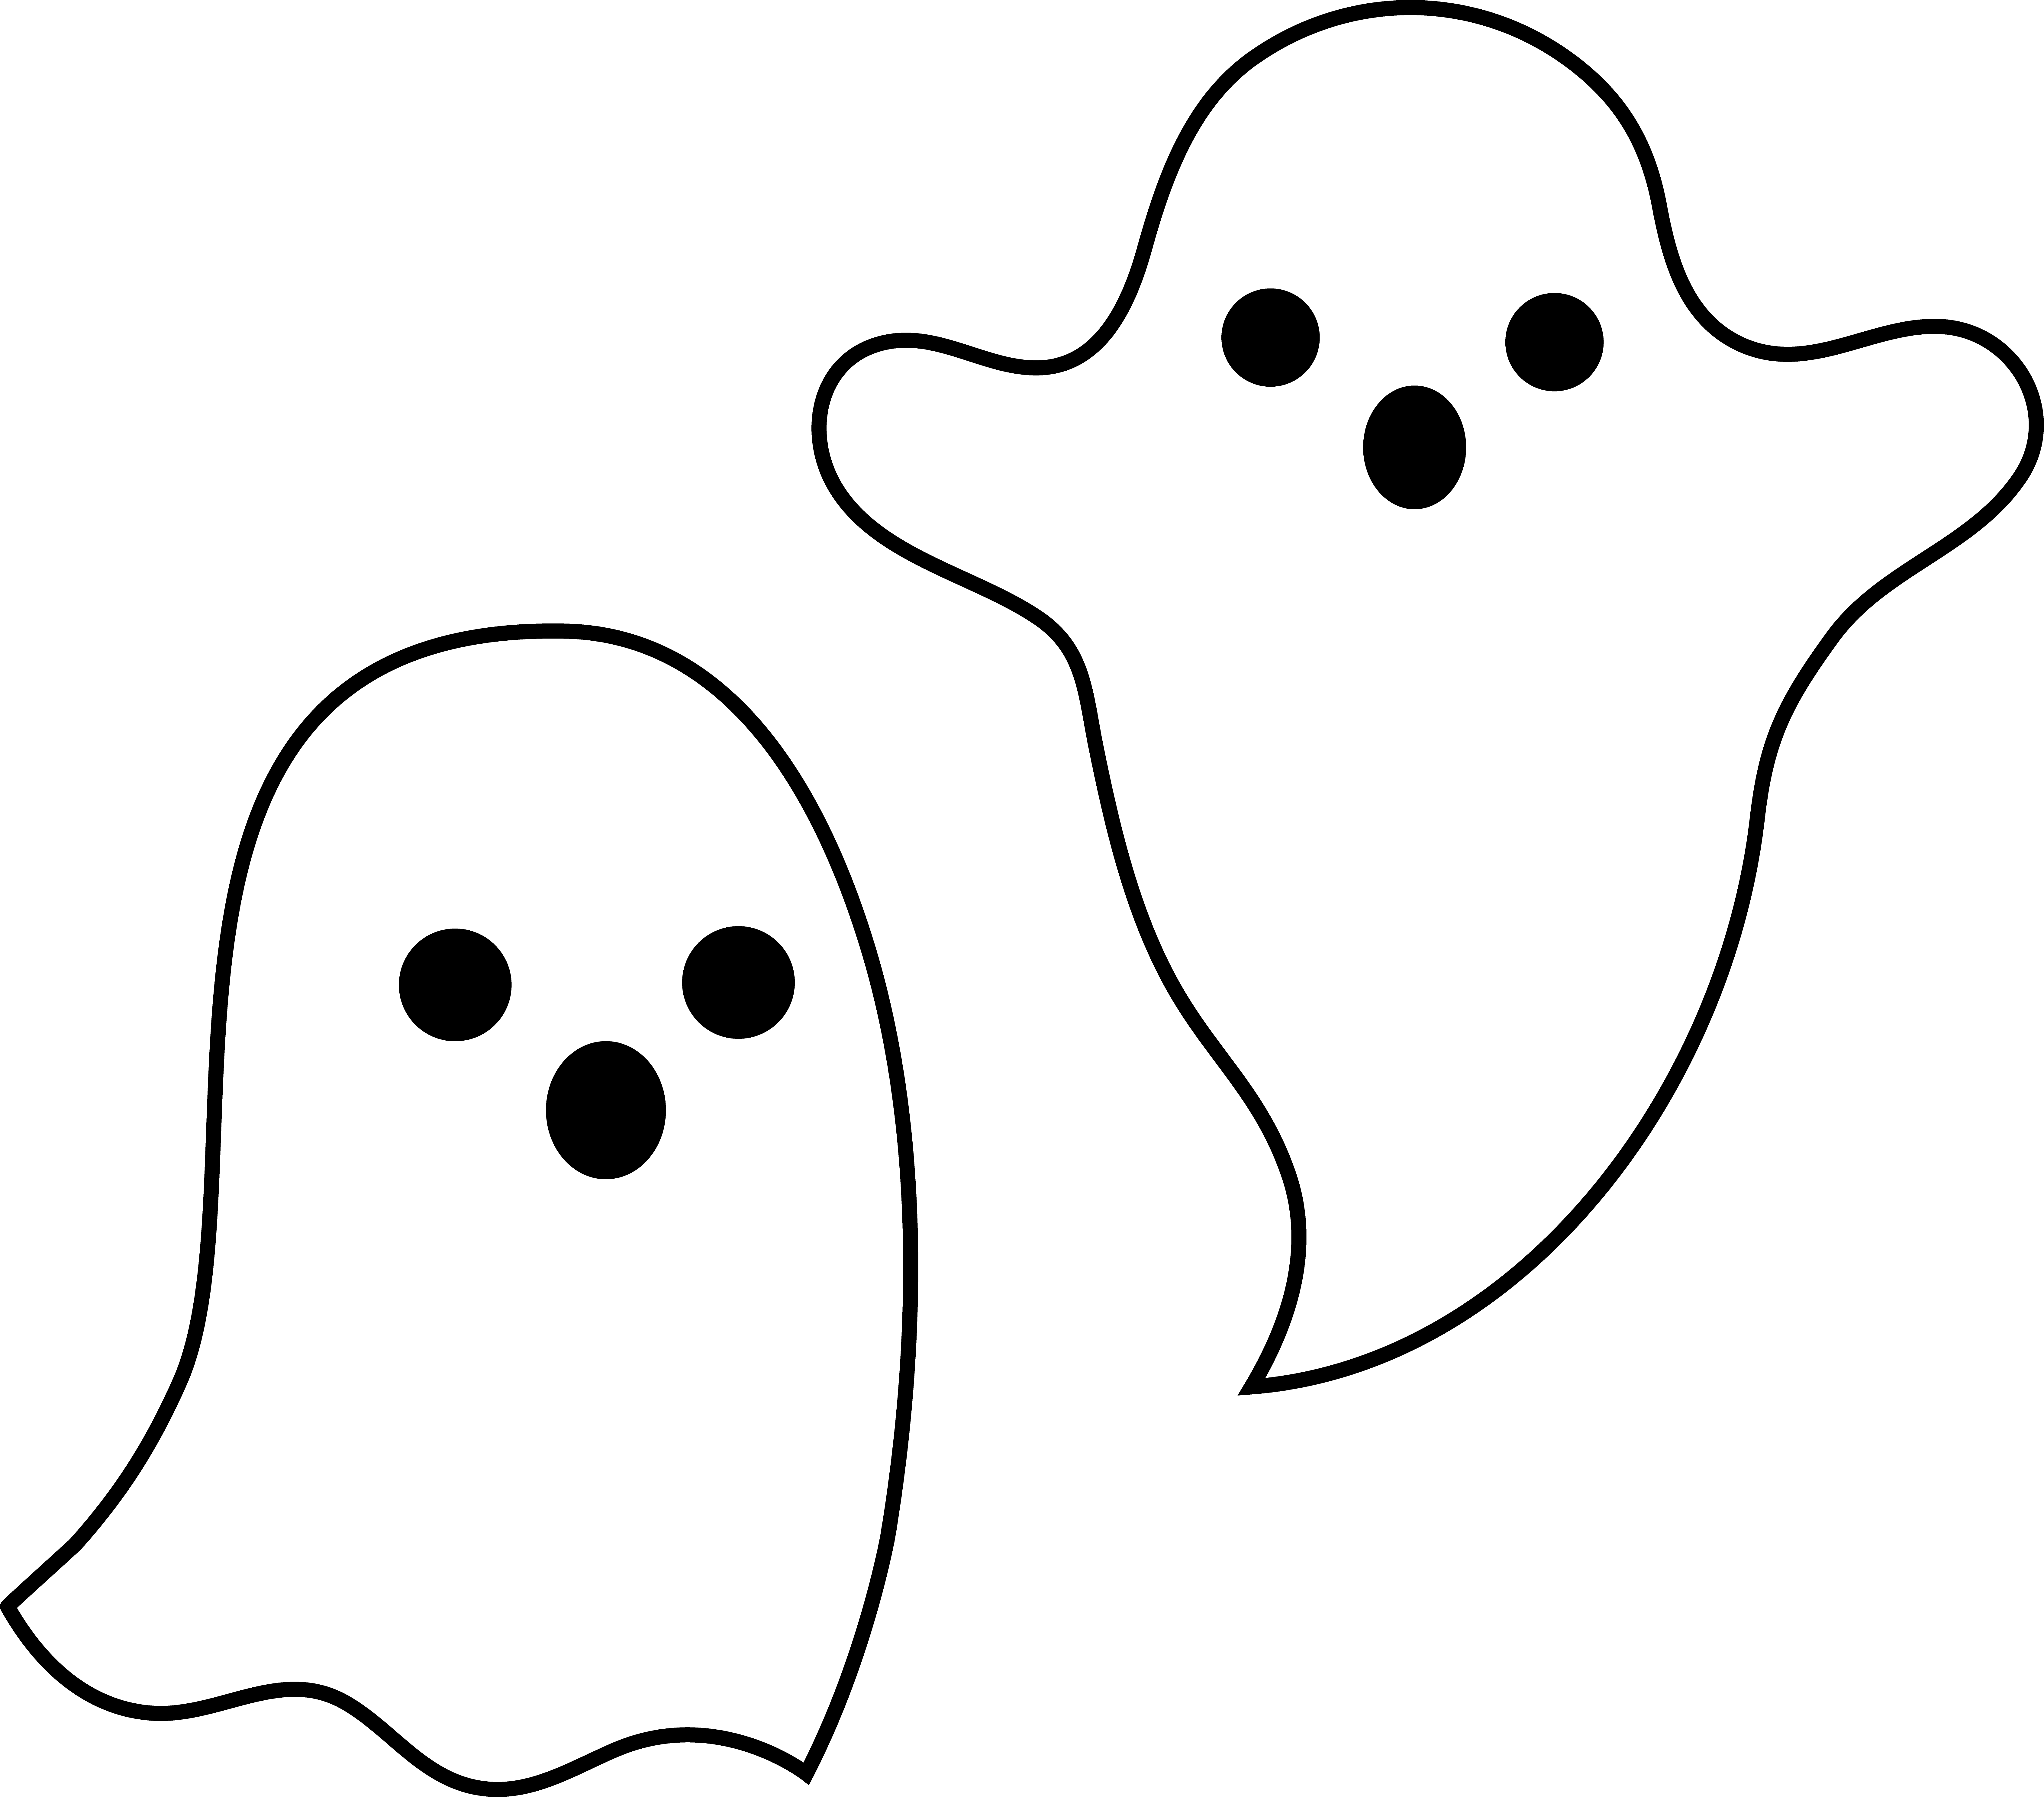 Cute Halloween Ghost Clipart-Cute Halloween Ghost Clipart-7